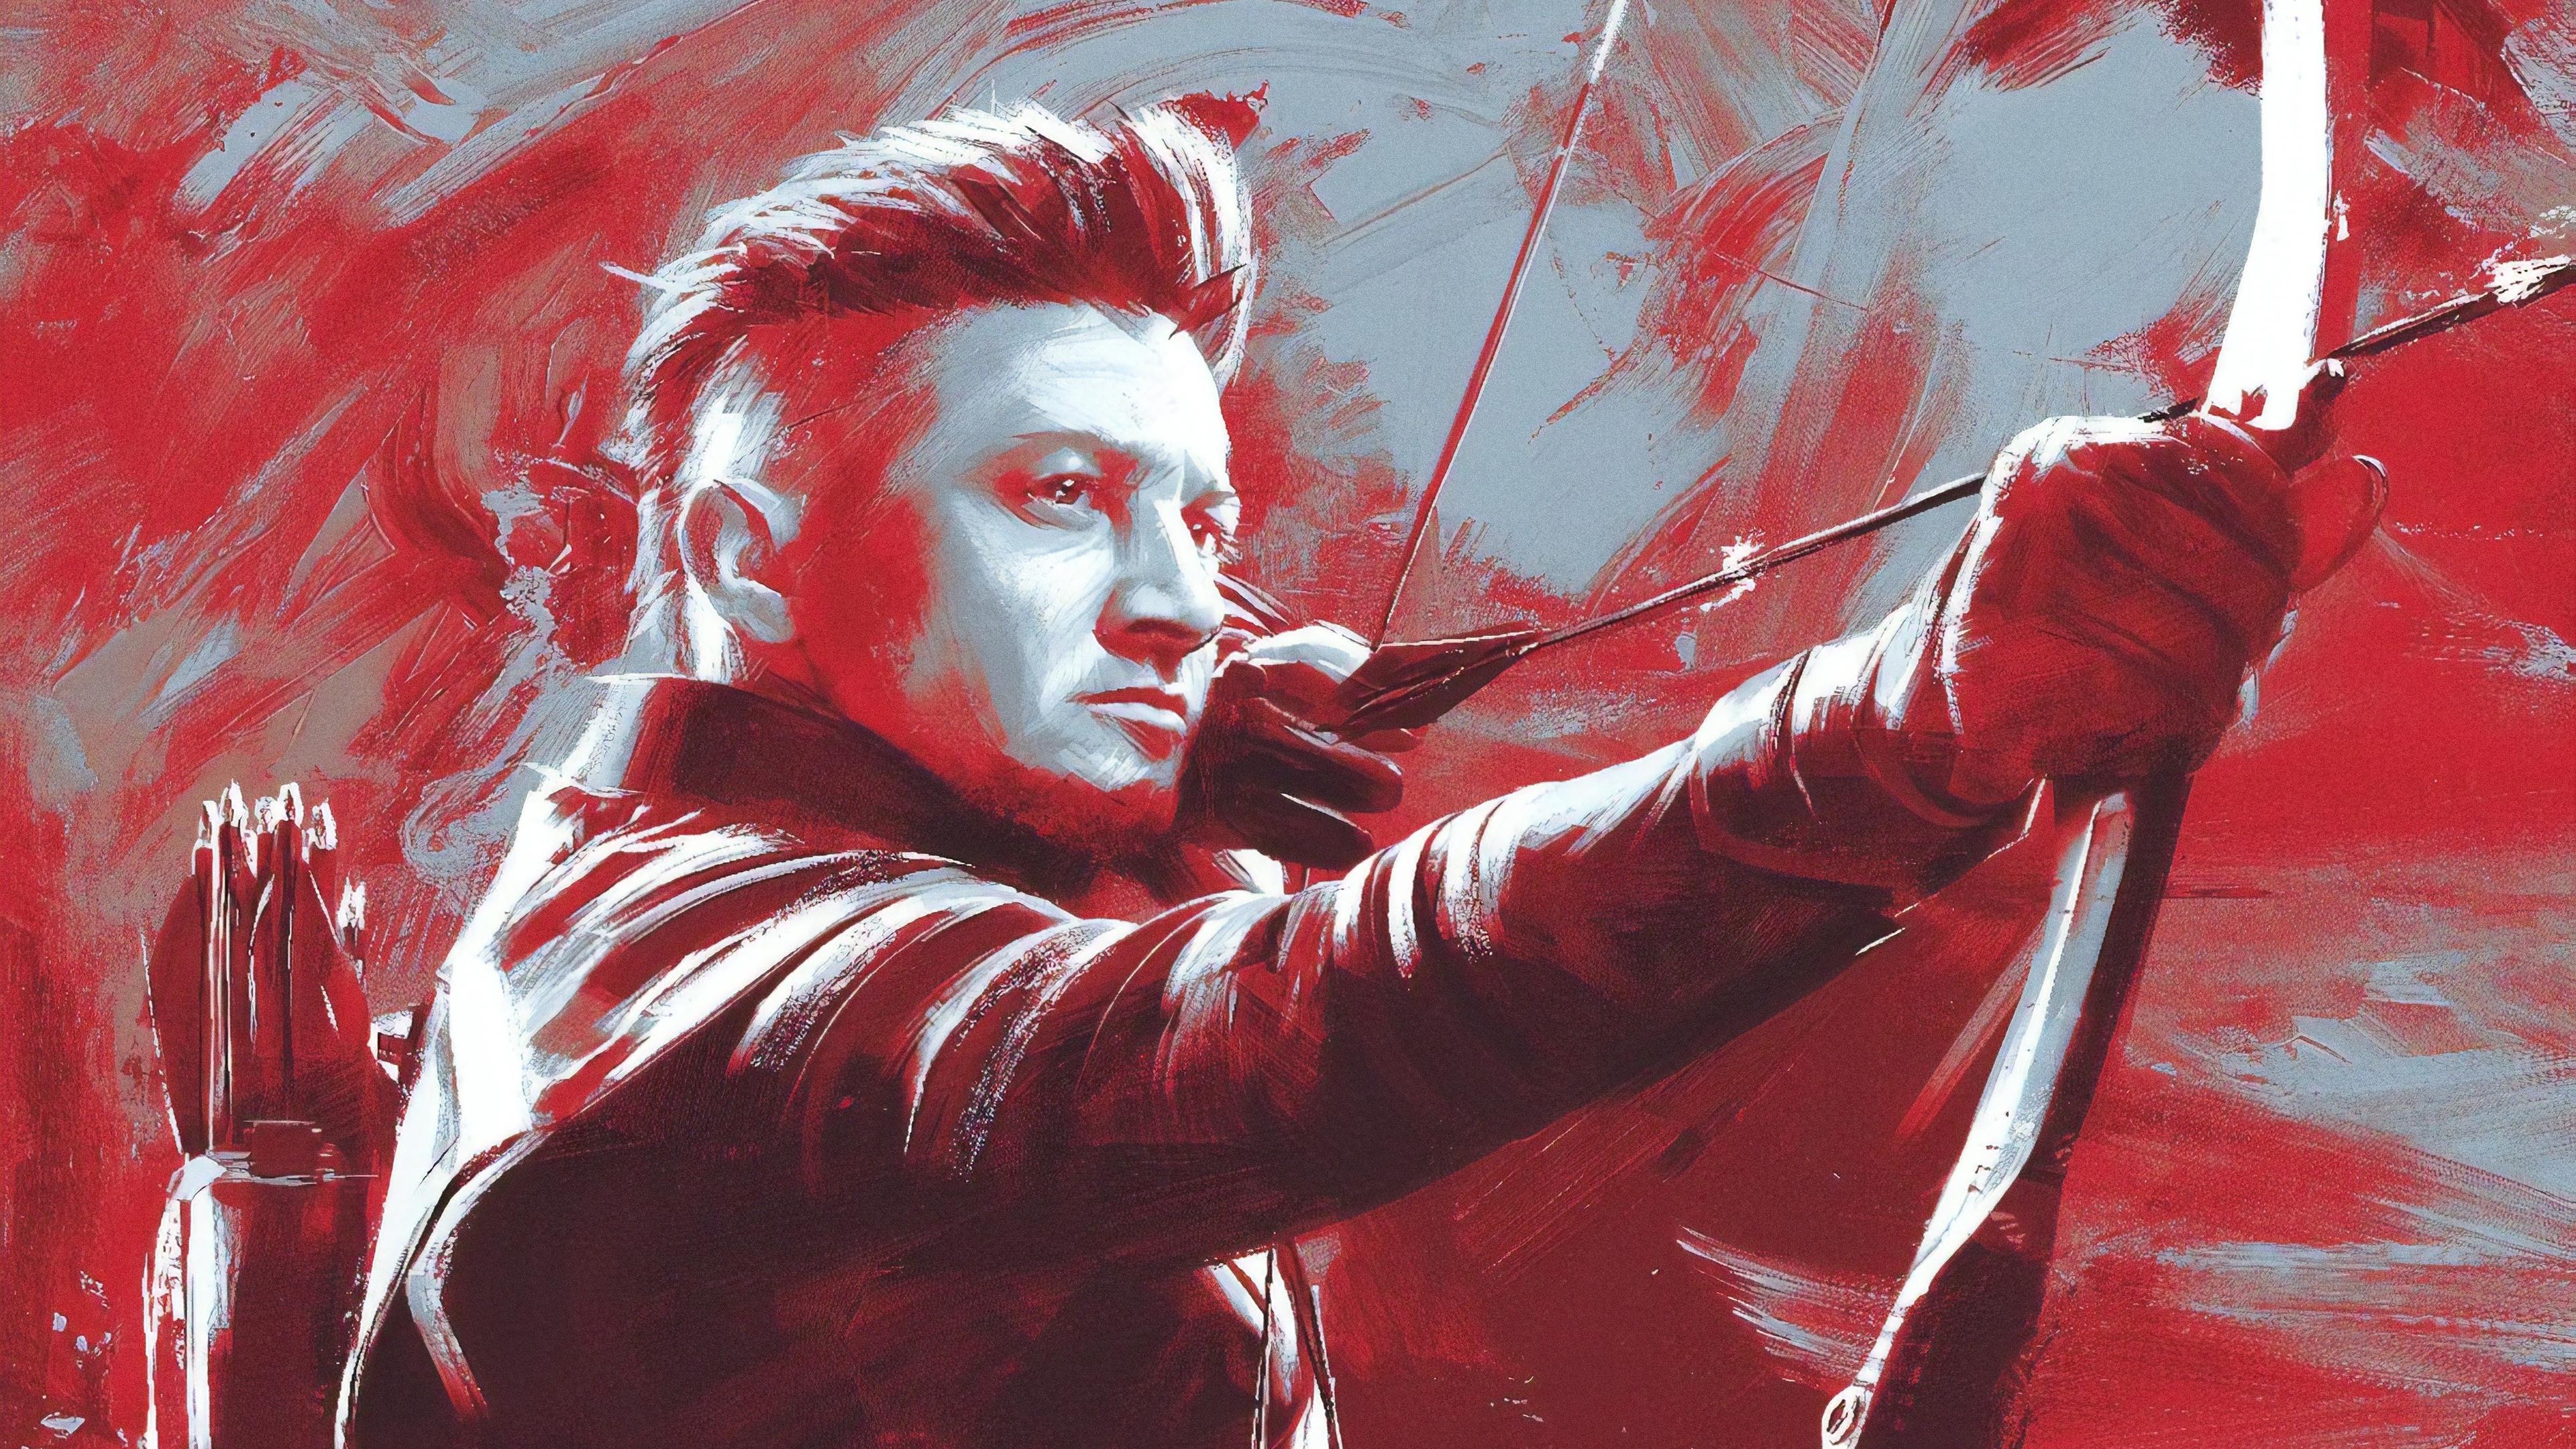 ronin hawkeye avengers endgame 2019 4k 1548528391 - Ronin Hawkeye Avengers EndGame 2019 4k - superheroes wallpapers, ronin wallpapers, movies wallpapers, hd-wallpapers, hawkeye wallpapers, avengers end game wallpapers, 2019 movies wallpapers